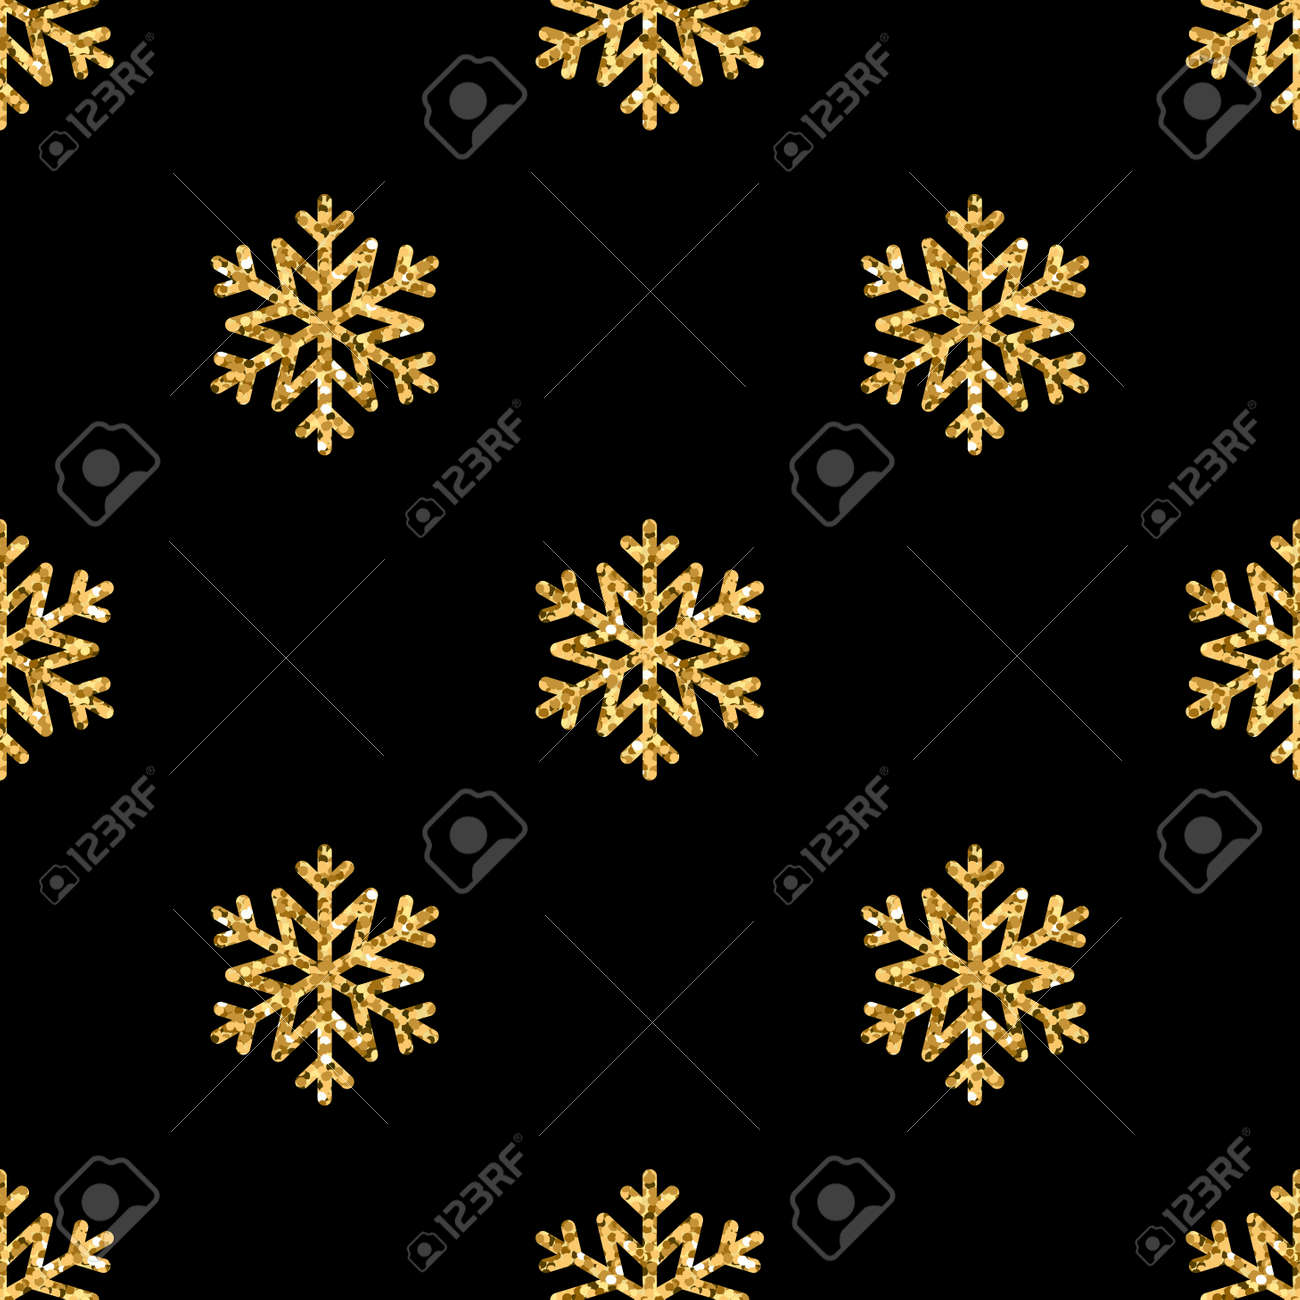 Christmas Snowflake Seamless Pattern Gold Snow Black Background